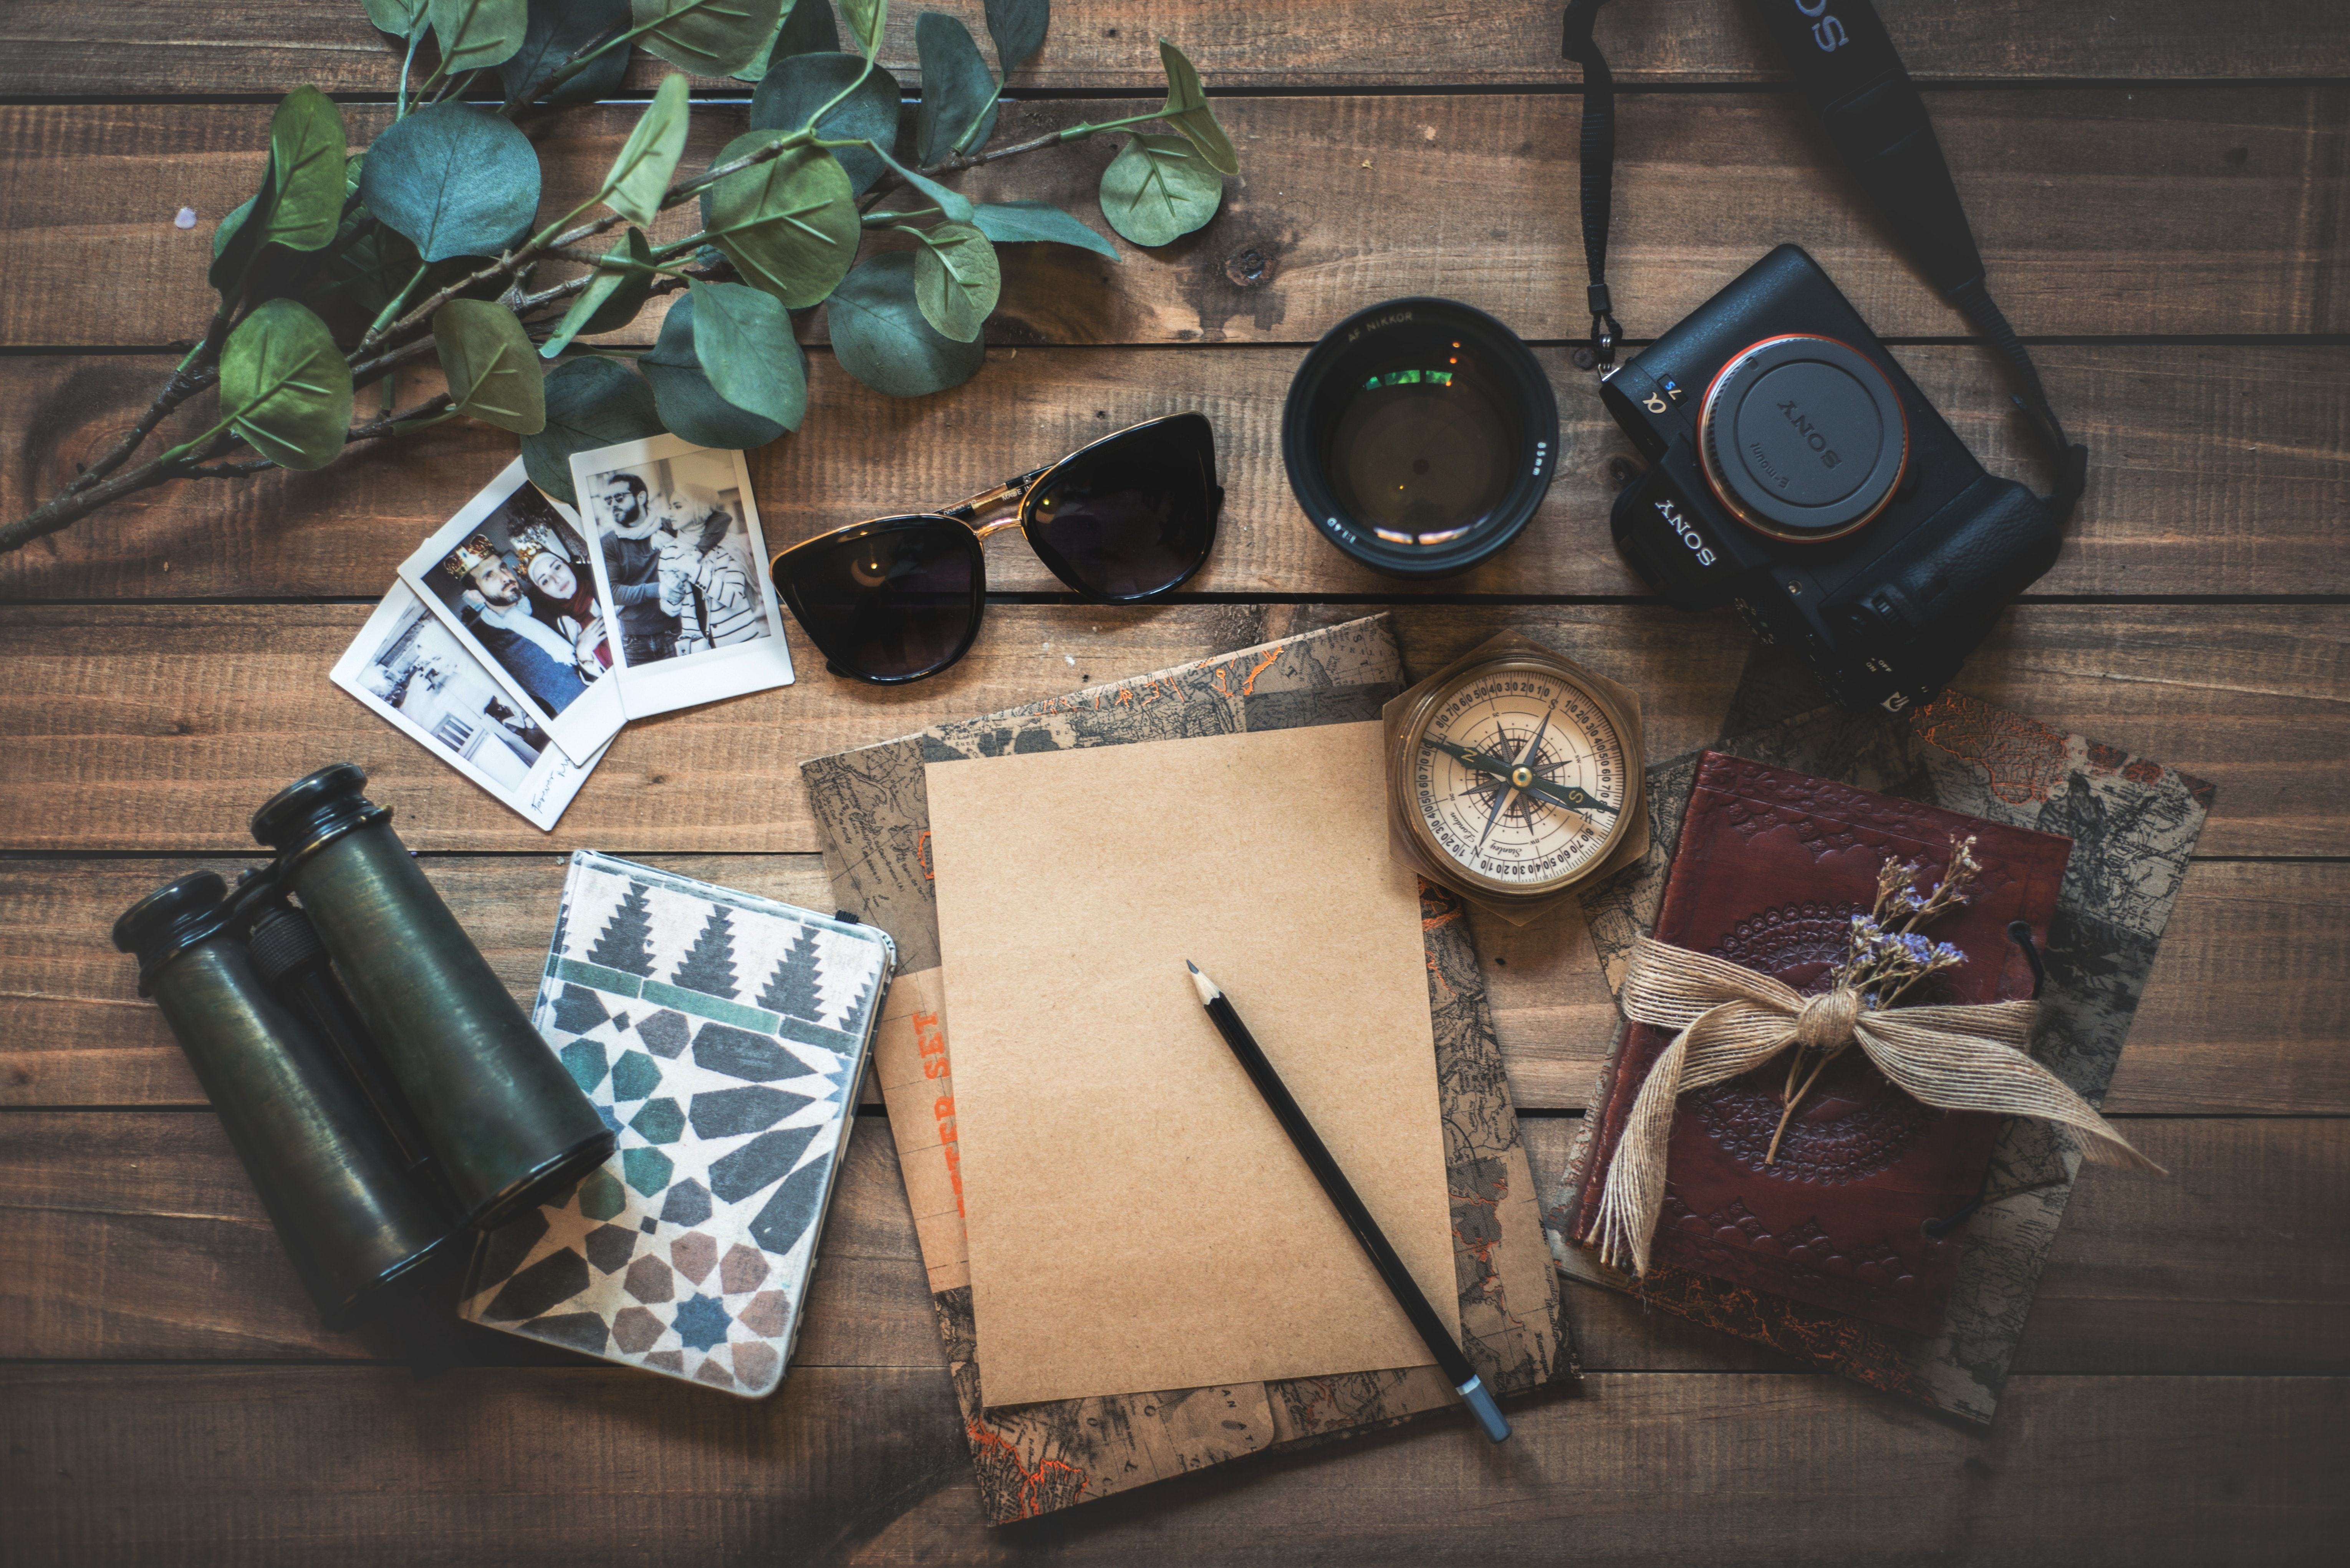 camera, notebook, sunglasses